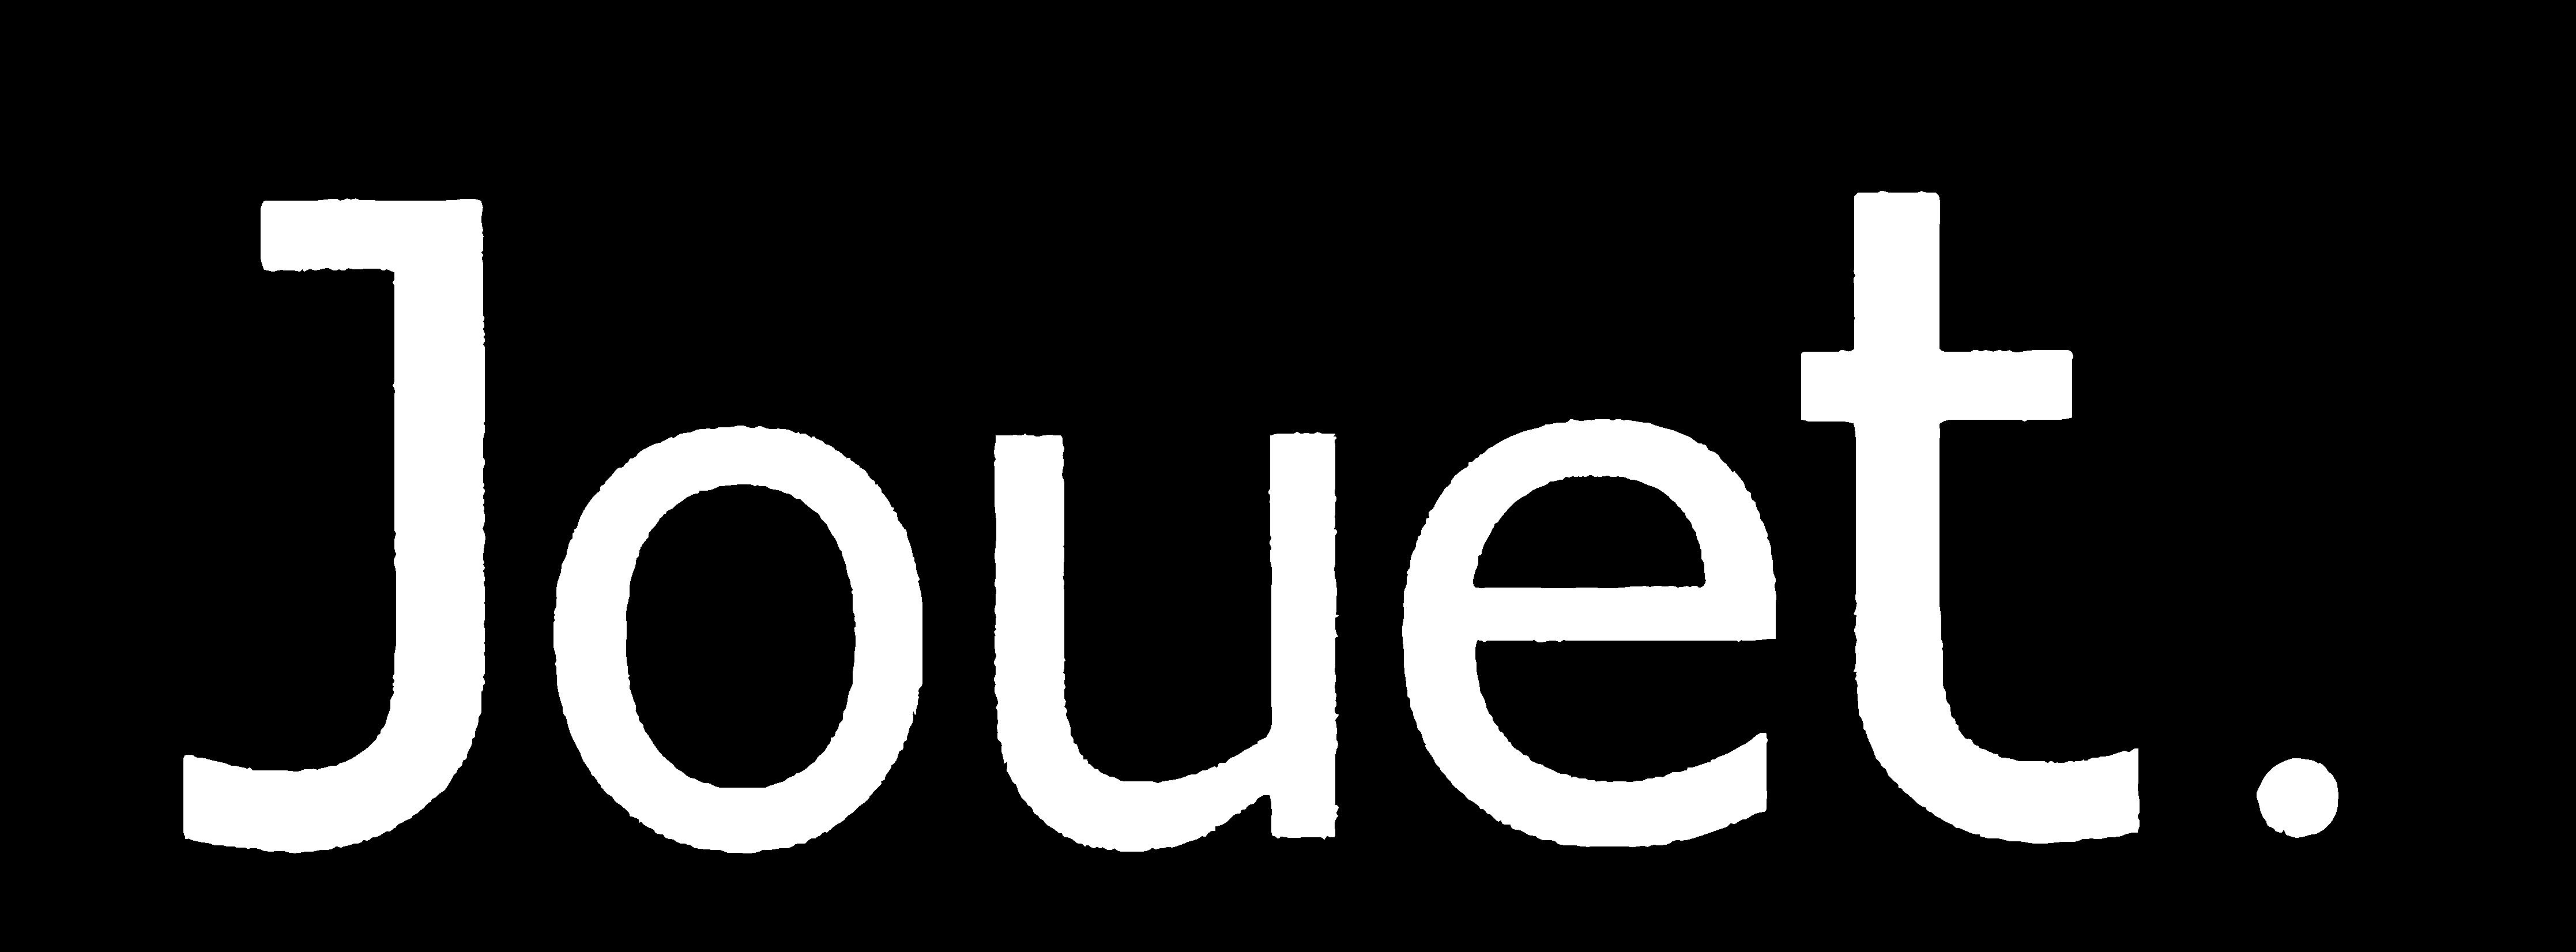 Jouet./心斎橋セレクトショップ